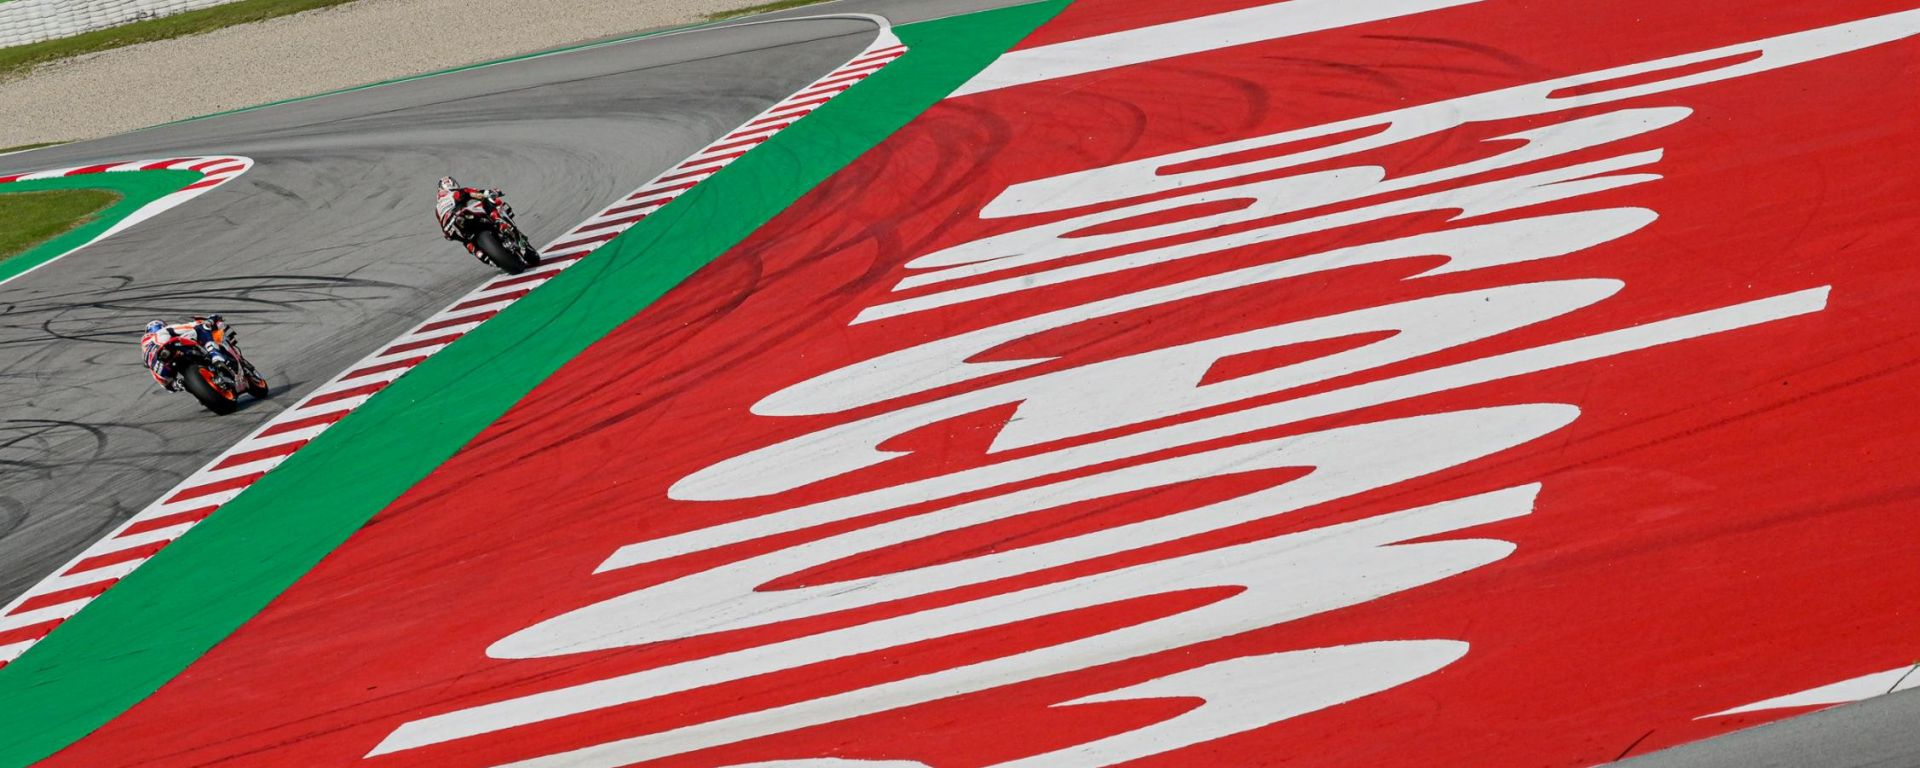 MotoGP Catalunya 2020, Barcellona: Nakagami e Marquez (Honda)